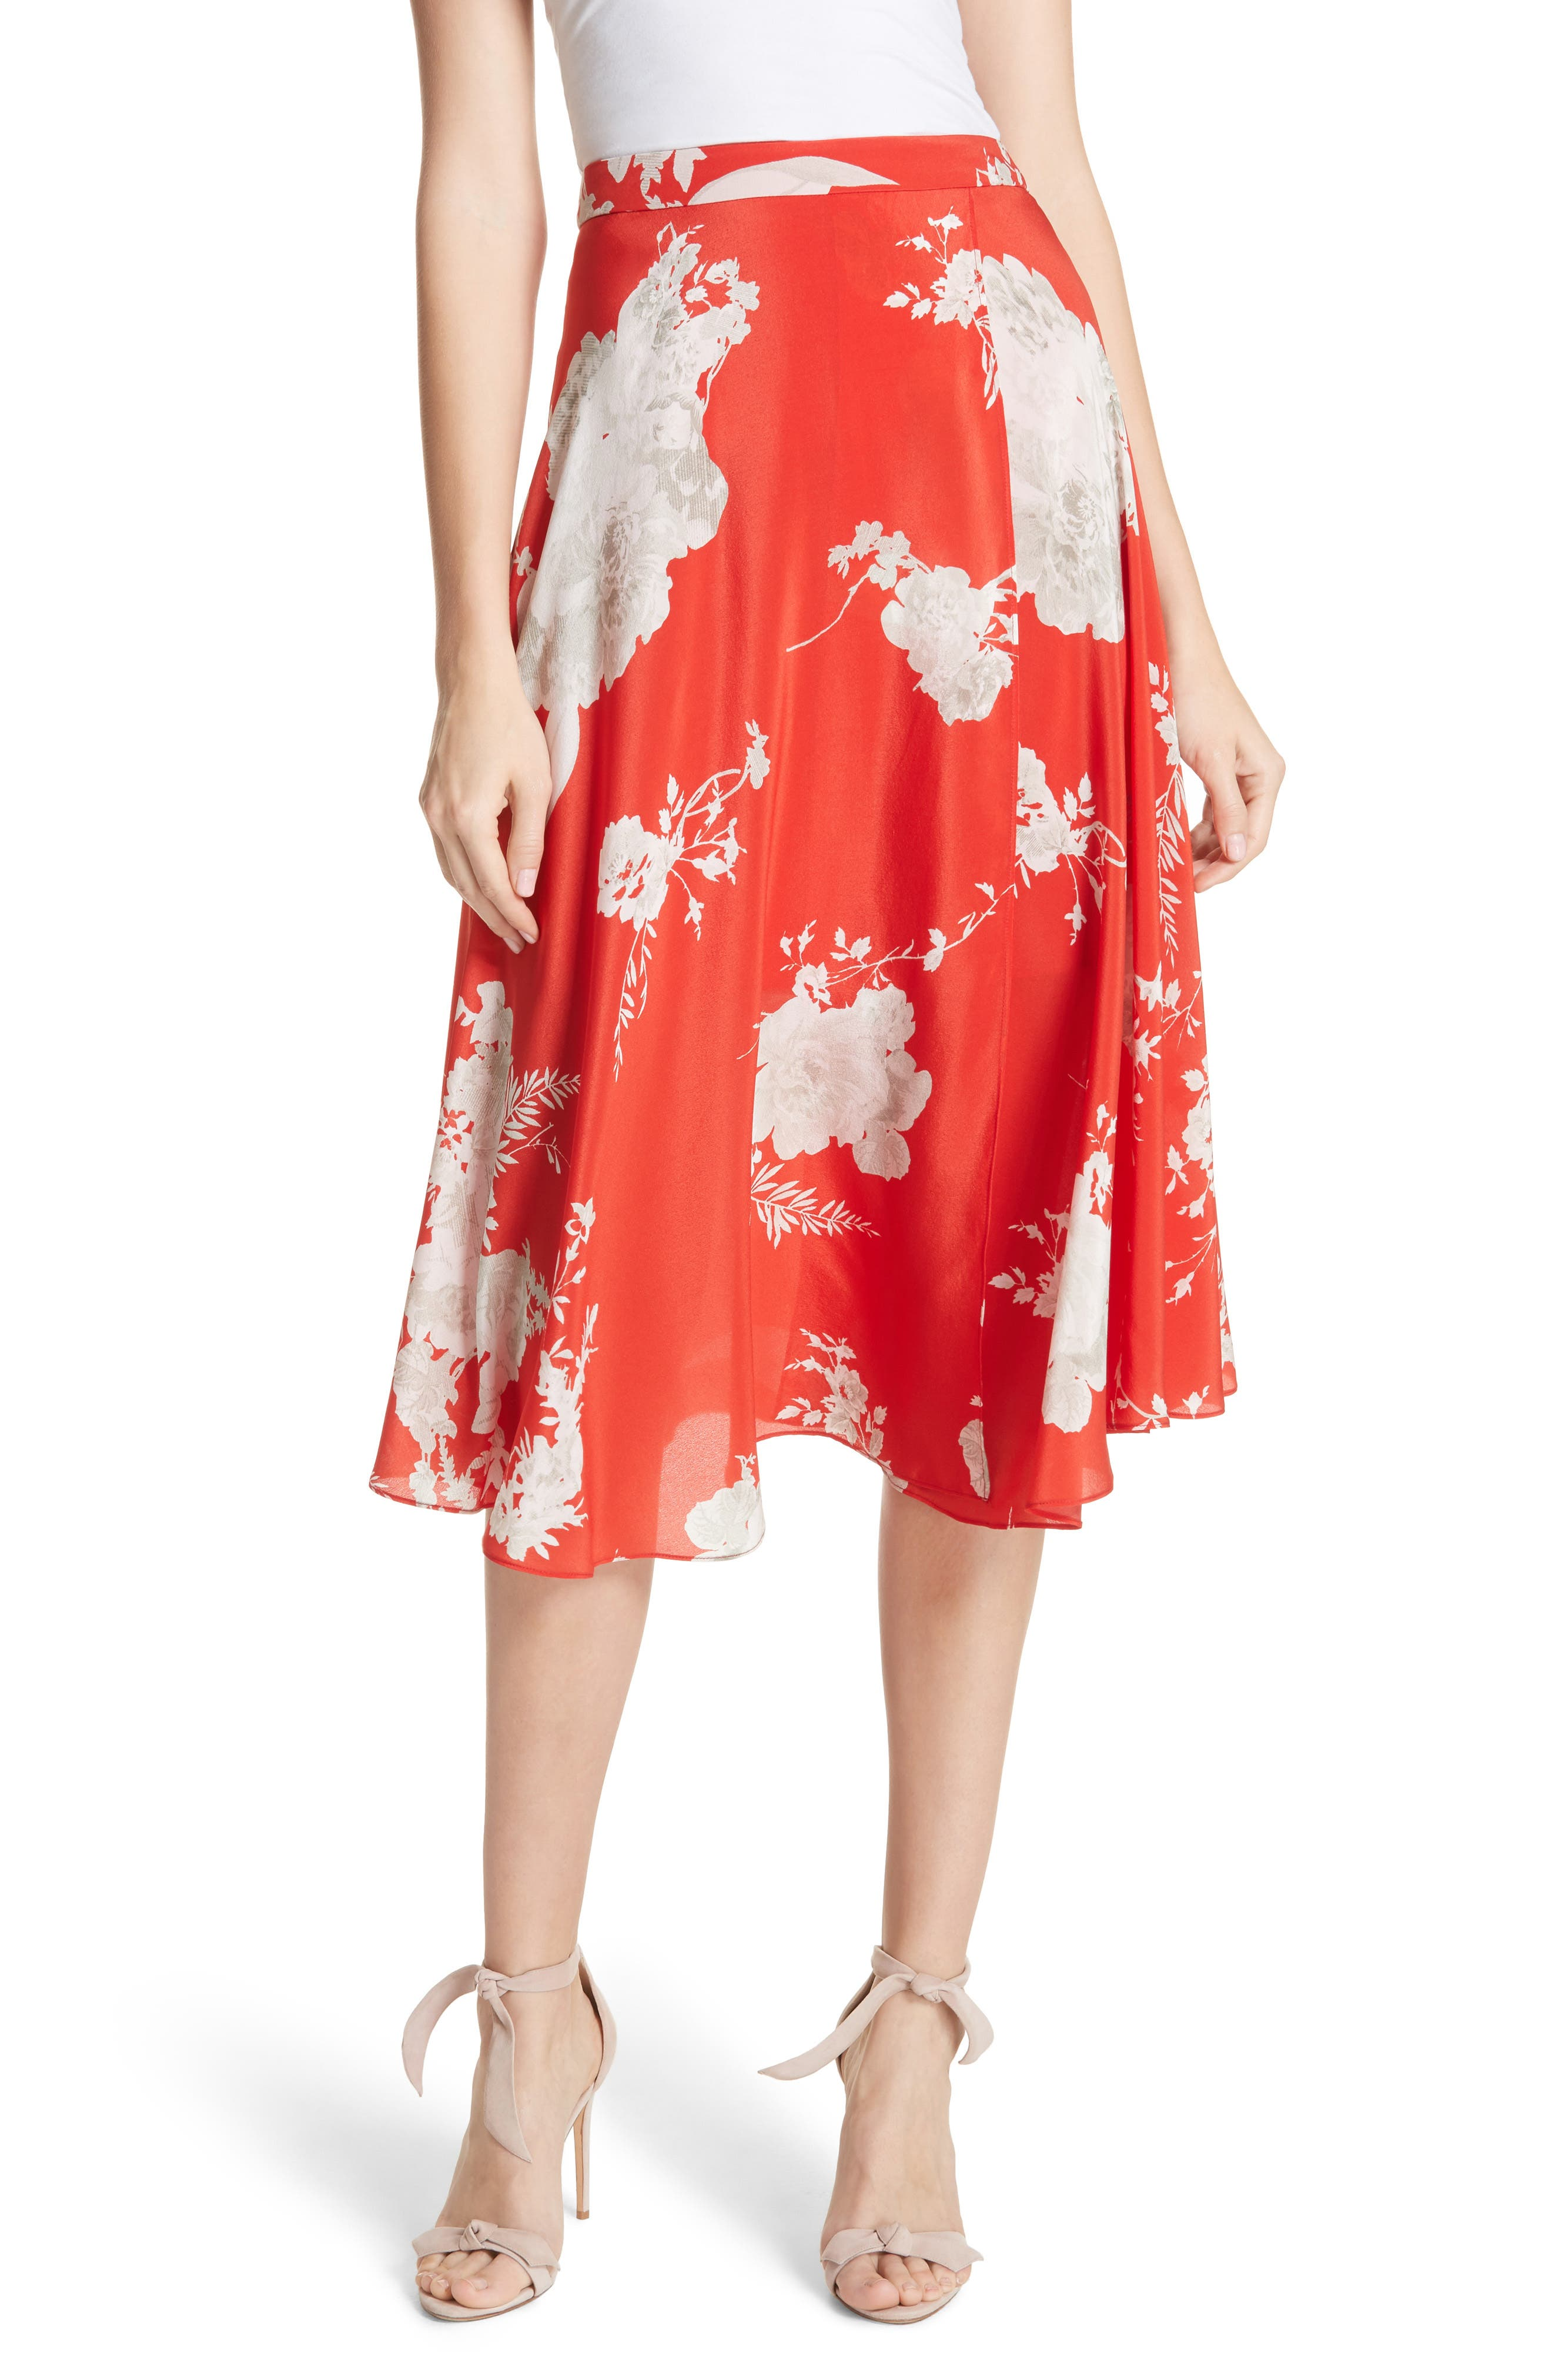 ALICE + OLIVIA Nanette Faux Wrap Floral Silk Skirt, Main, color, 606